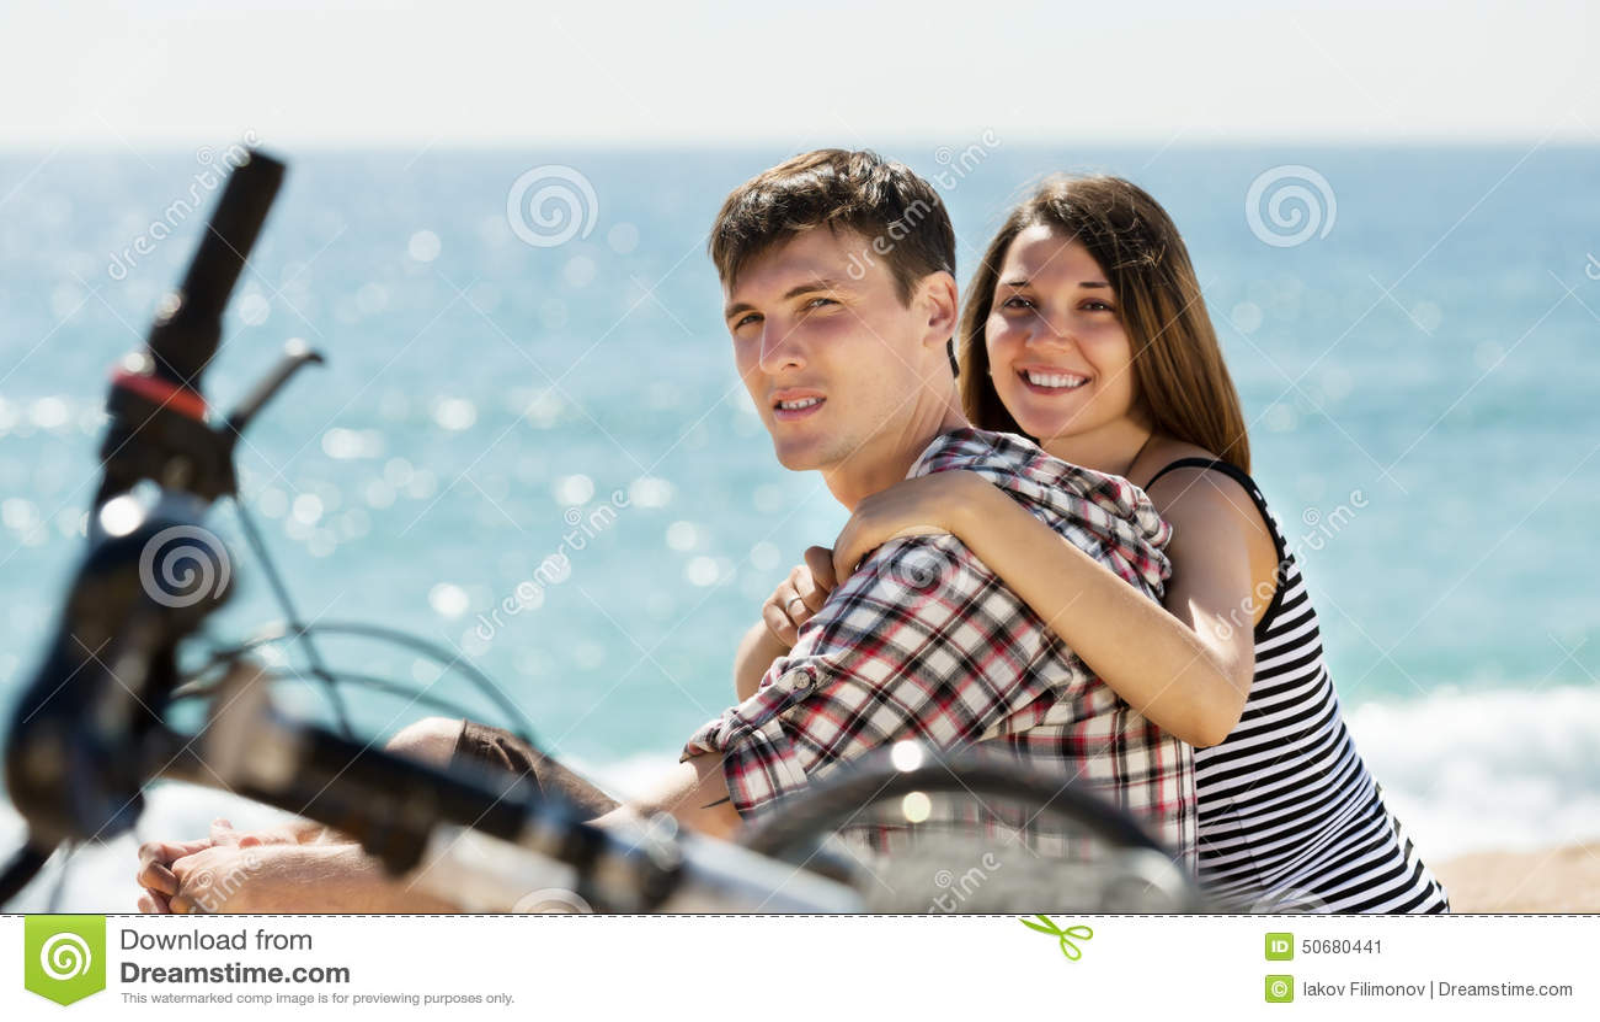 Download 加上在海滩的自行车 库存图片. 图片 包括有 偶然, boyscout, 循环, 生活方式, 夫妇, 关系 - 50680441